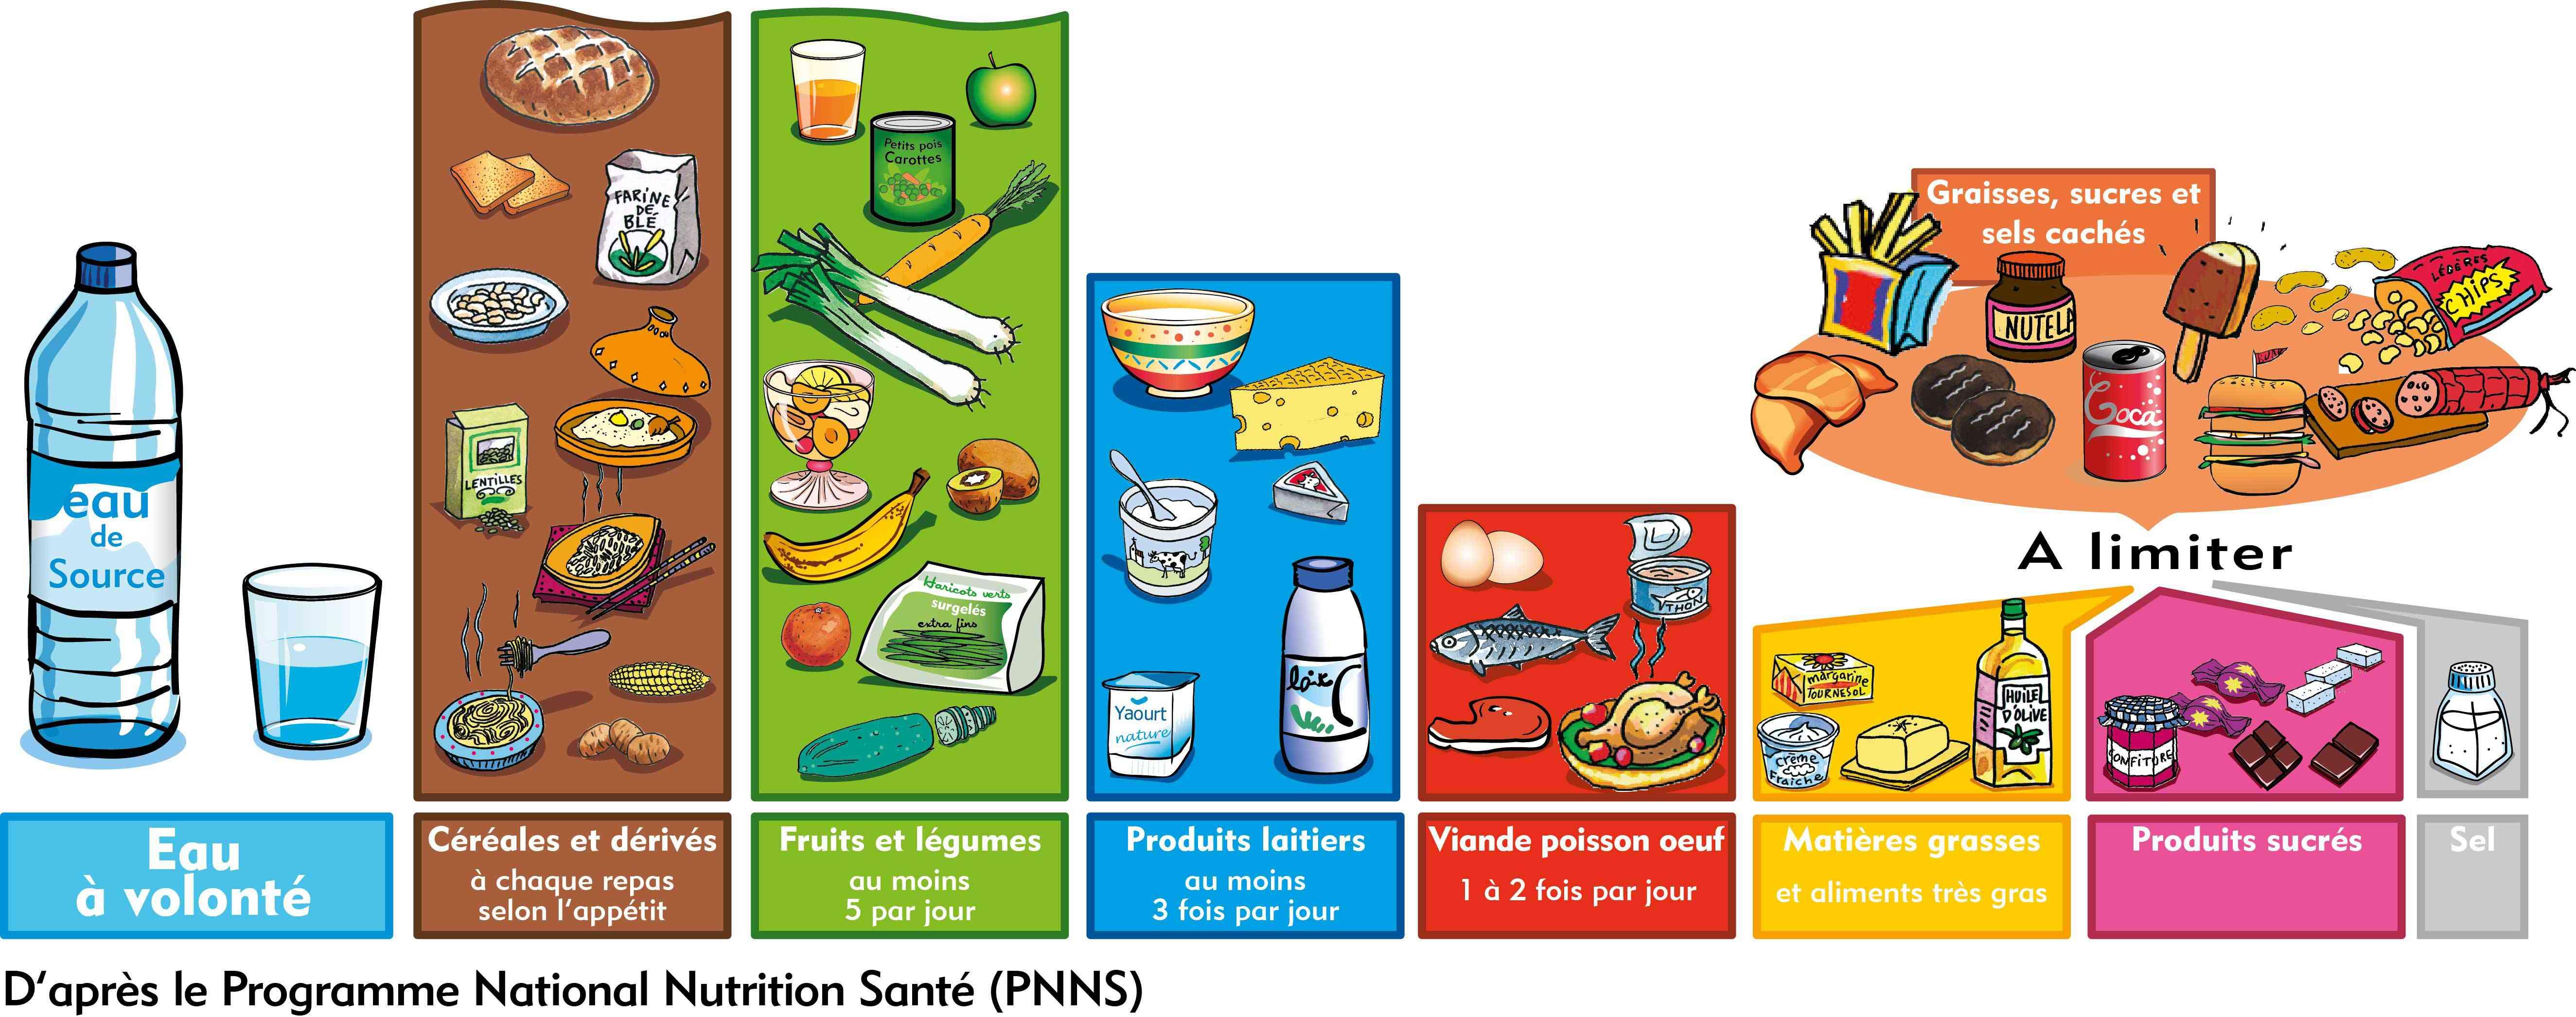 nutrition et alimentation equilibre alimentaire